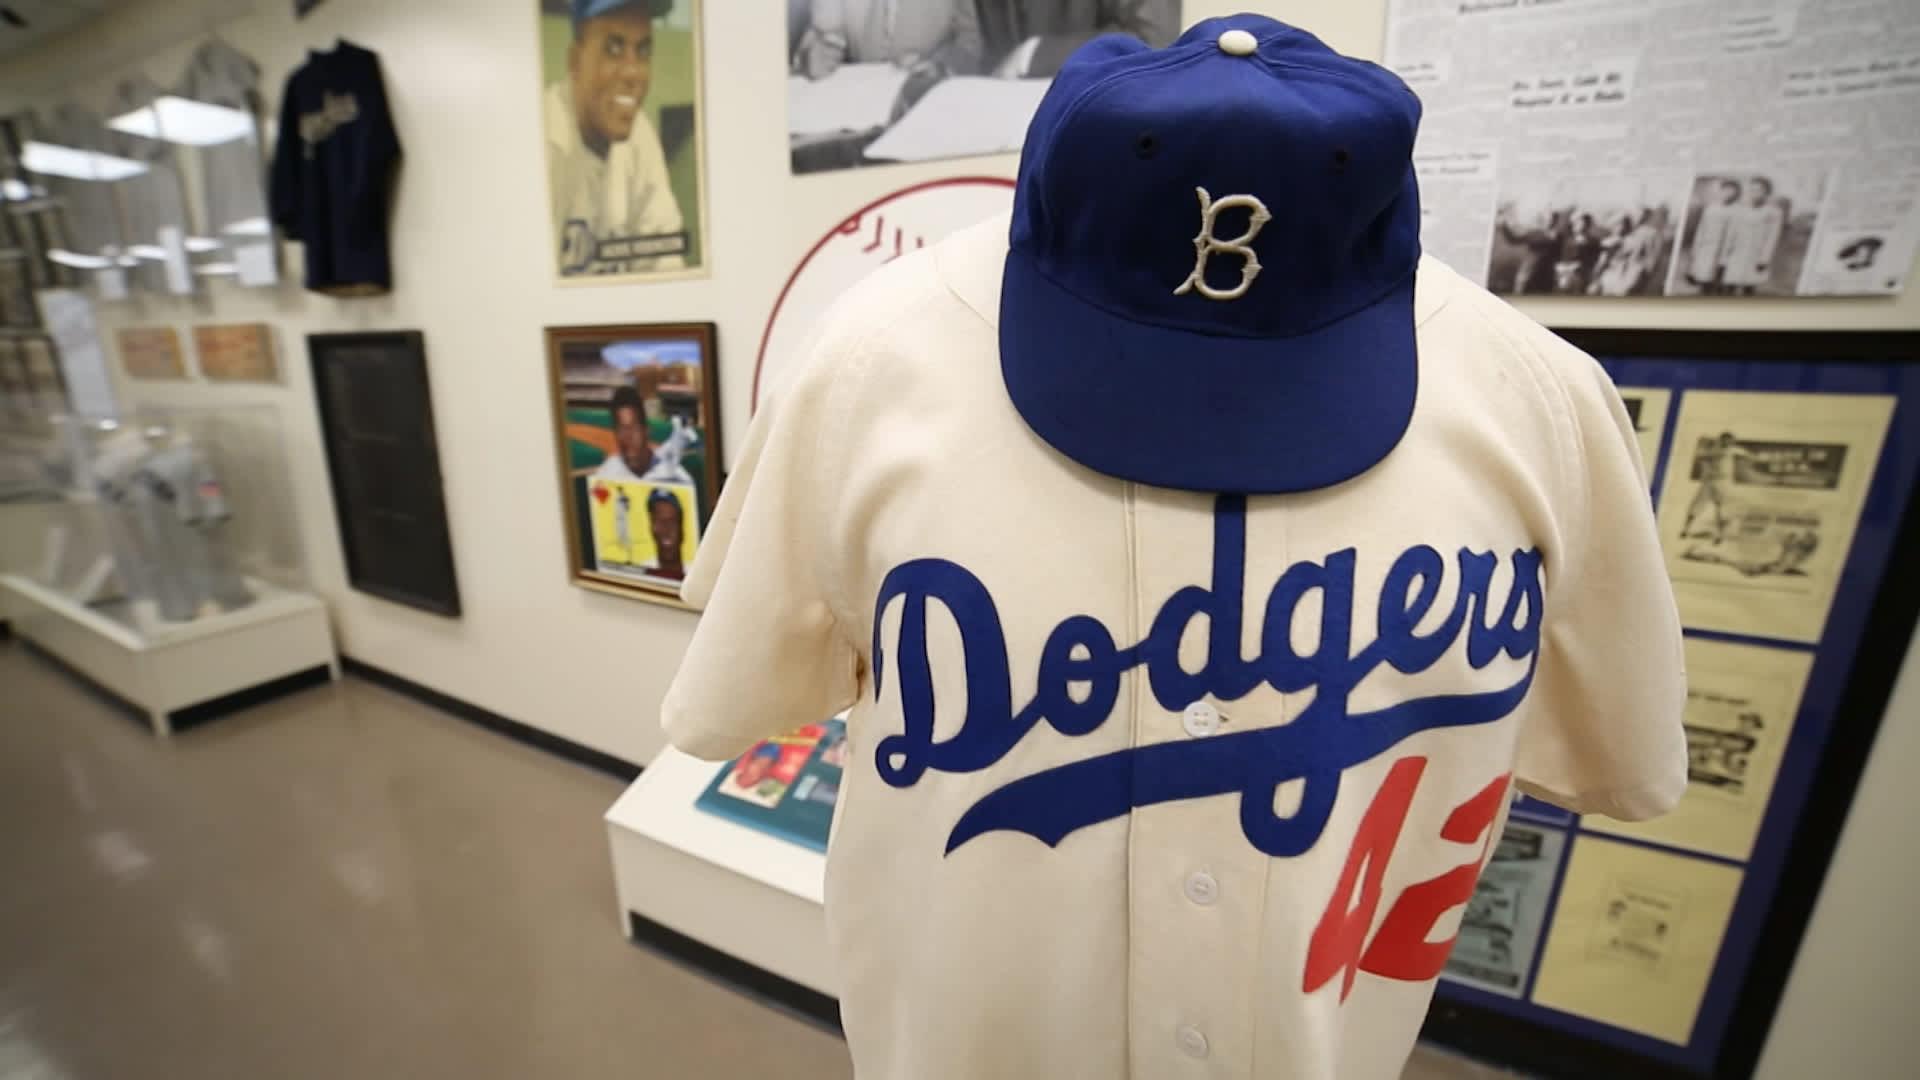 See Dodgers Fans Rare Baseball Memorabilia Collection